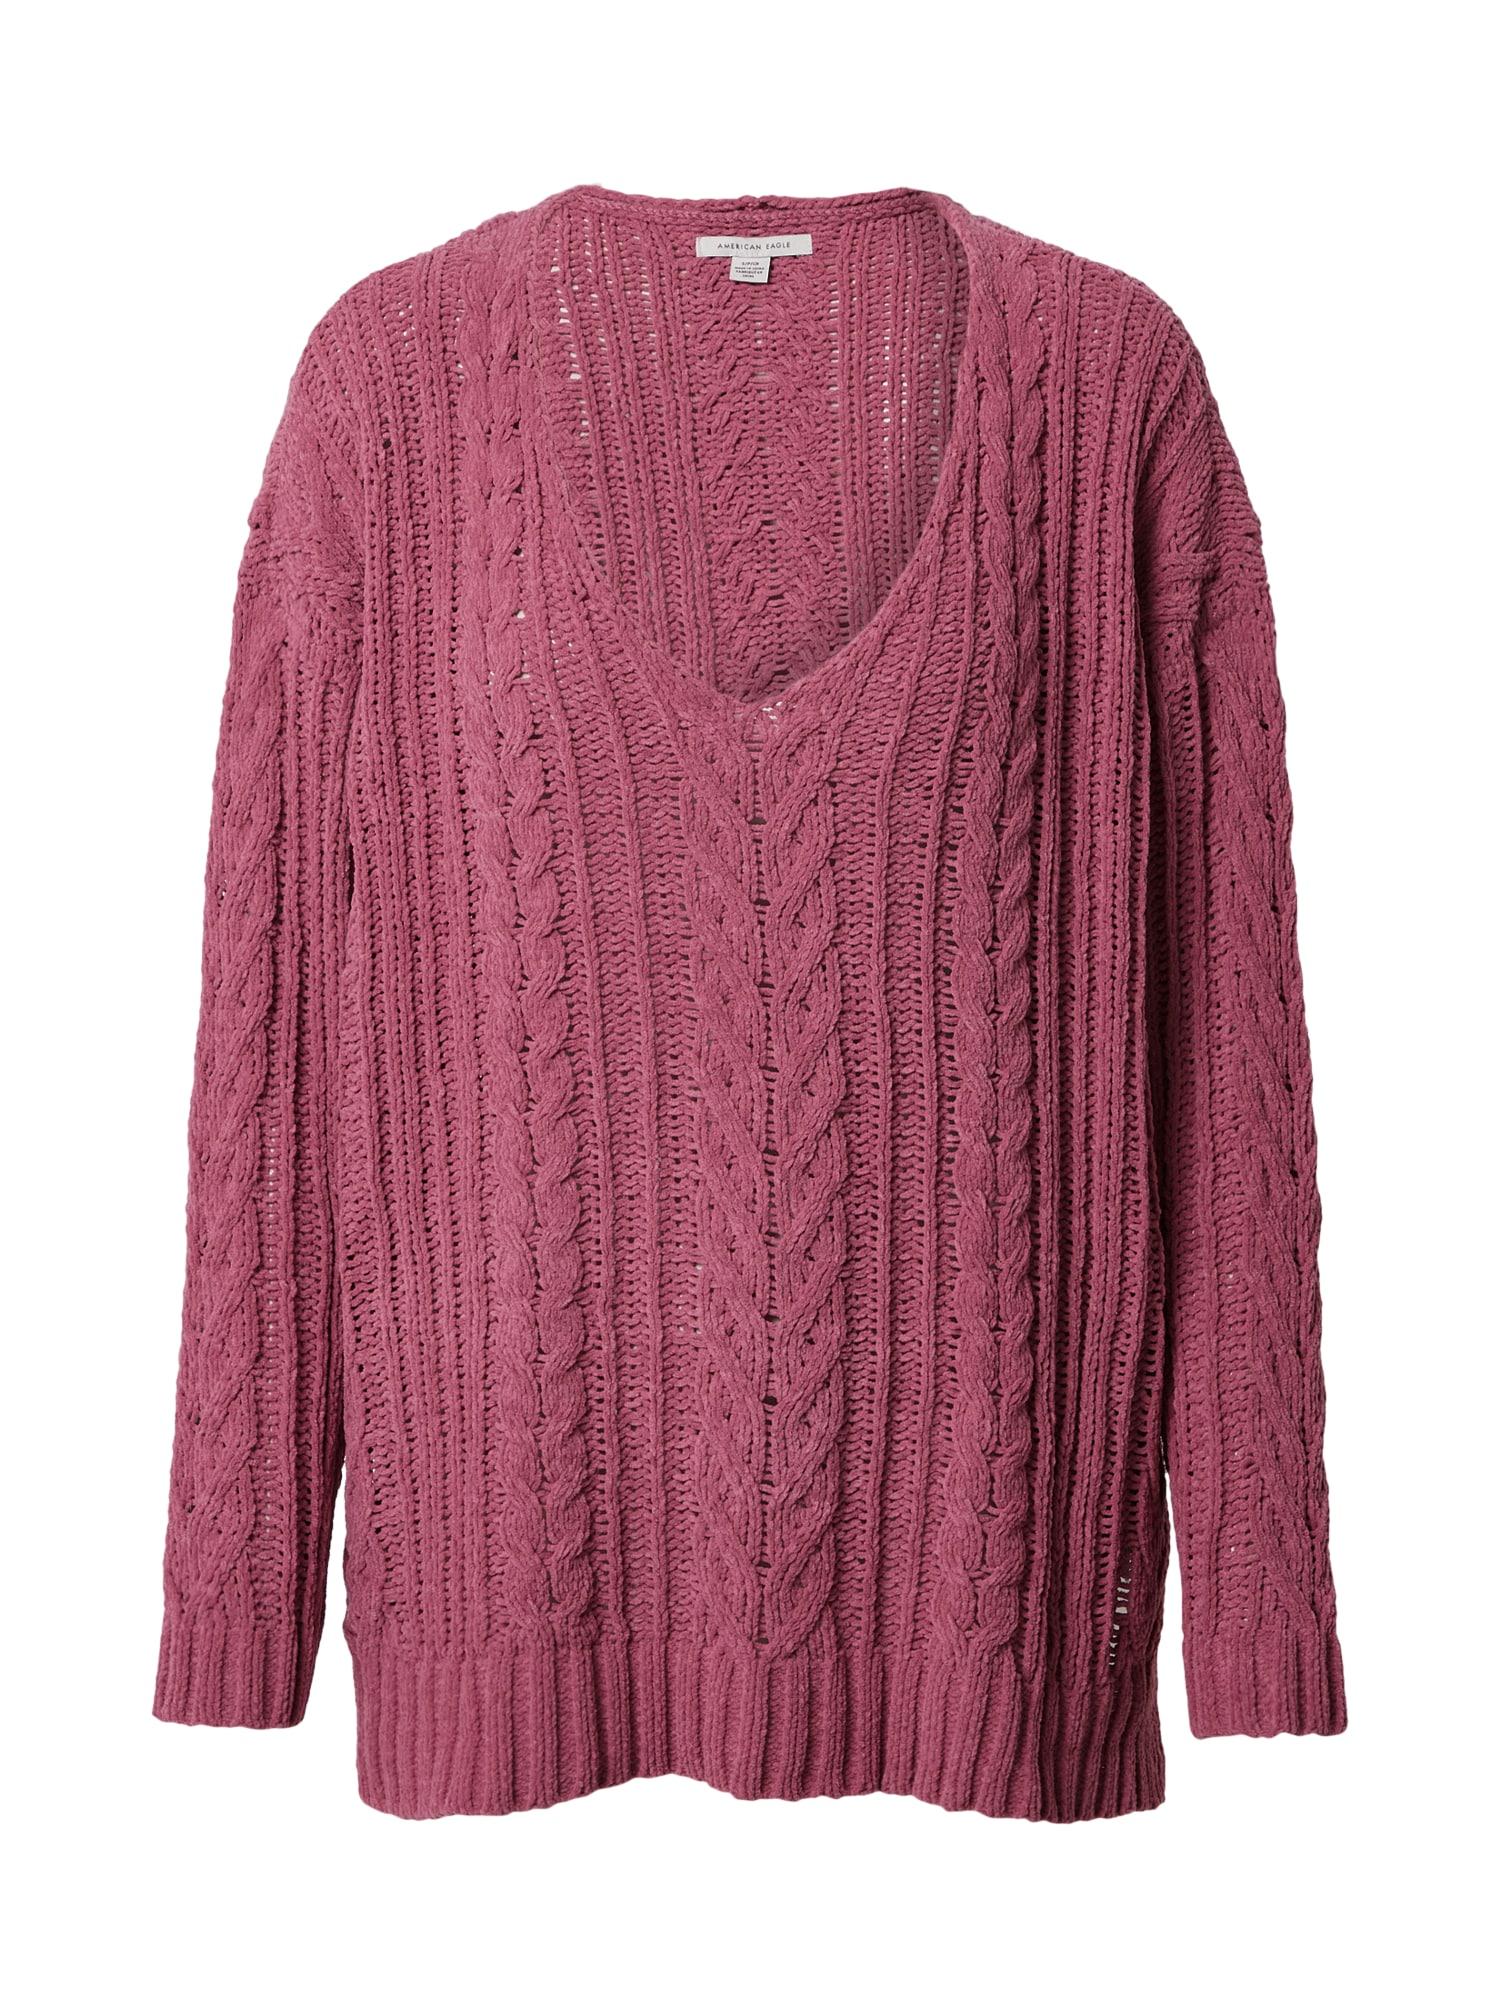 American Eagle Megztinis uogų spalva